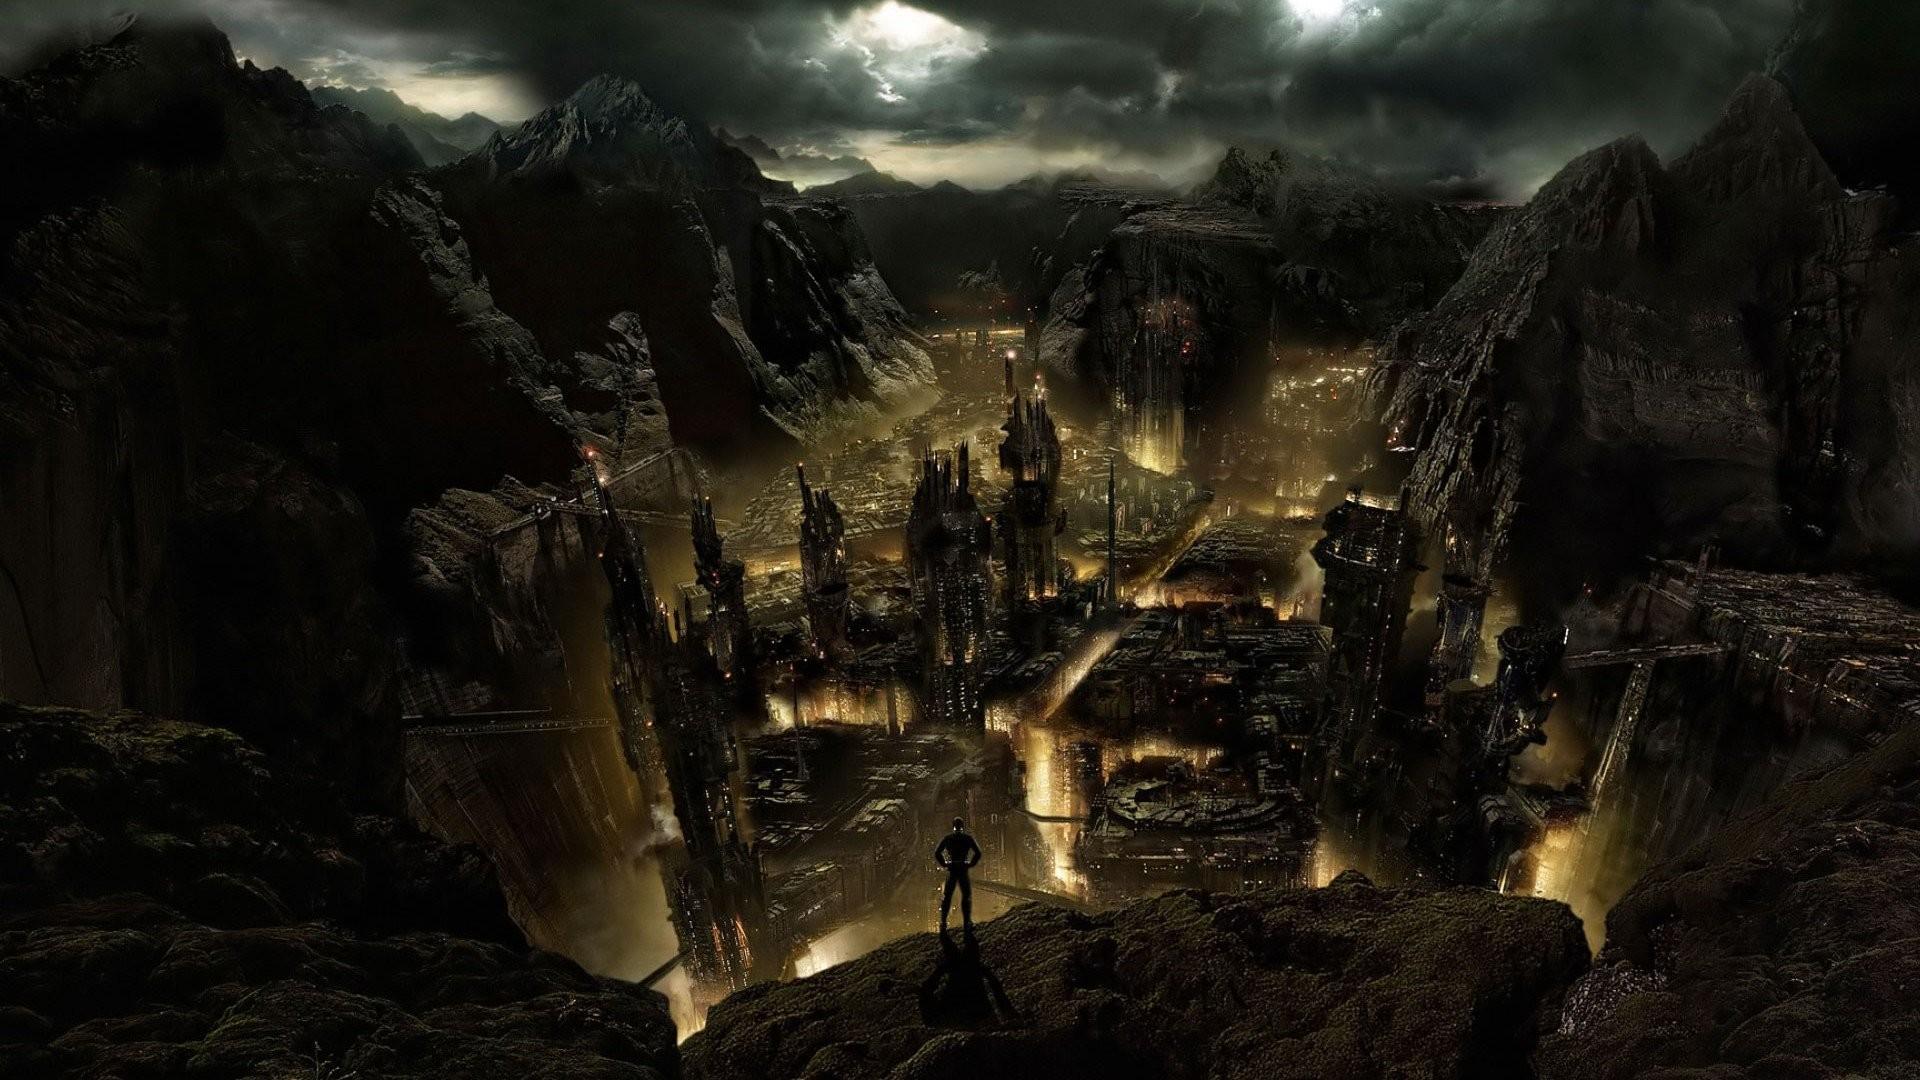 Alien Life Forms Asteroids Buildings Cityscapes Dark Sky Landscapes